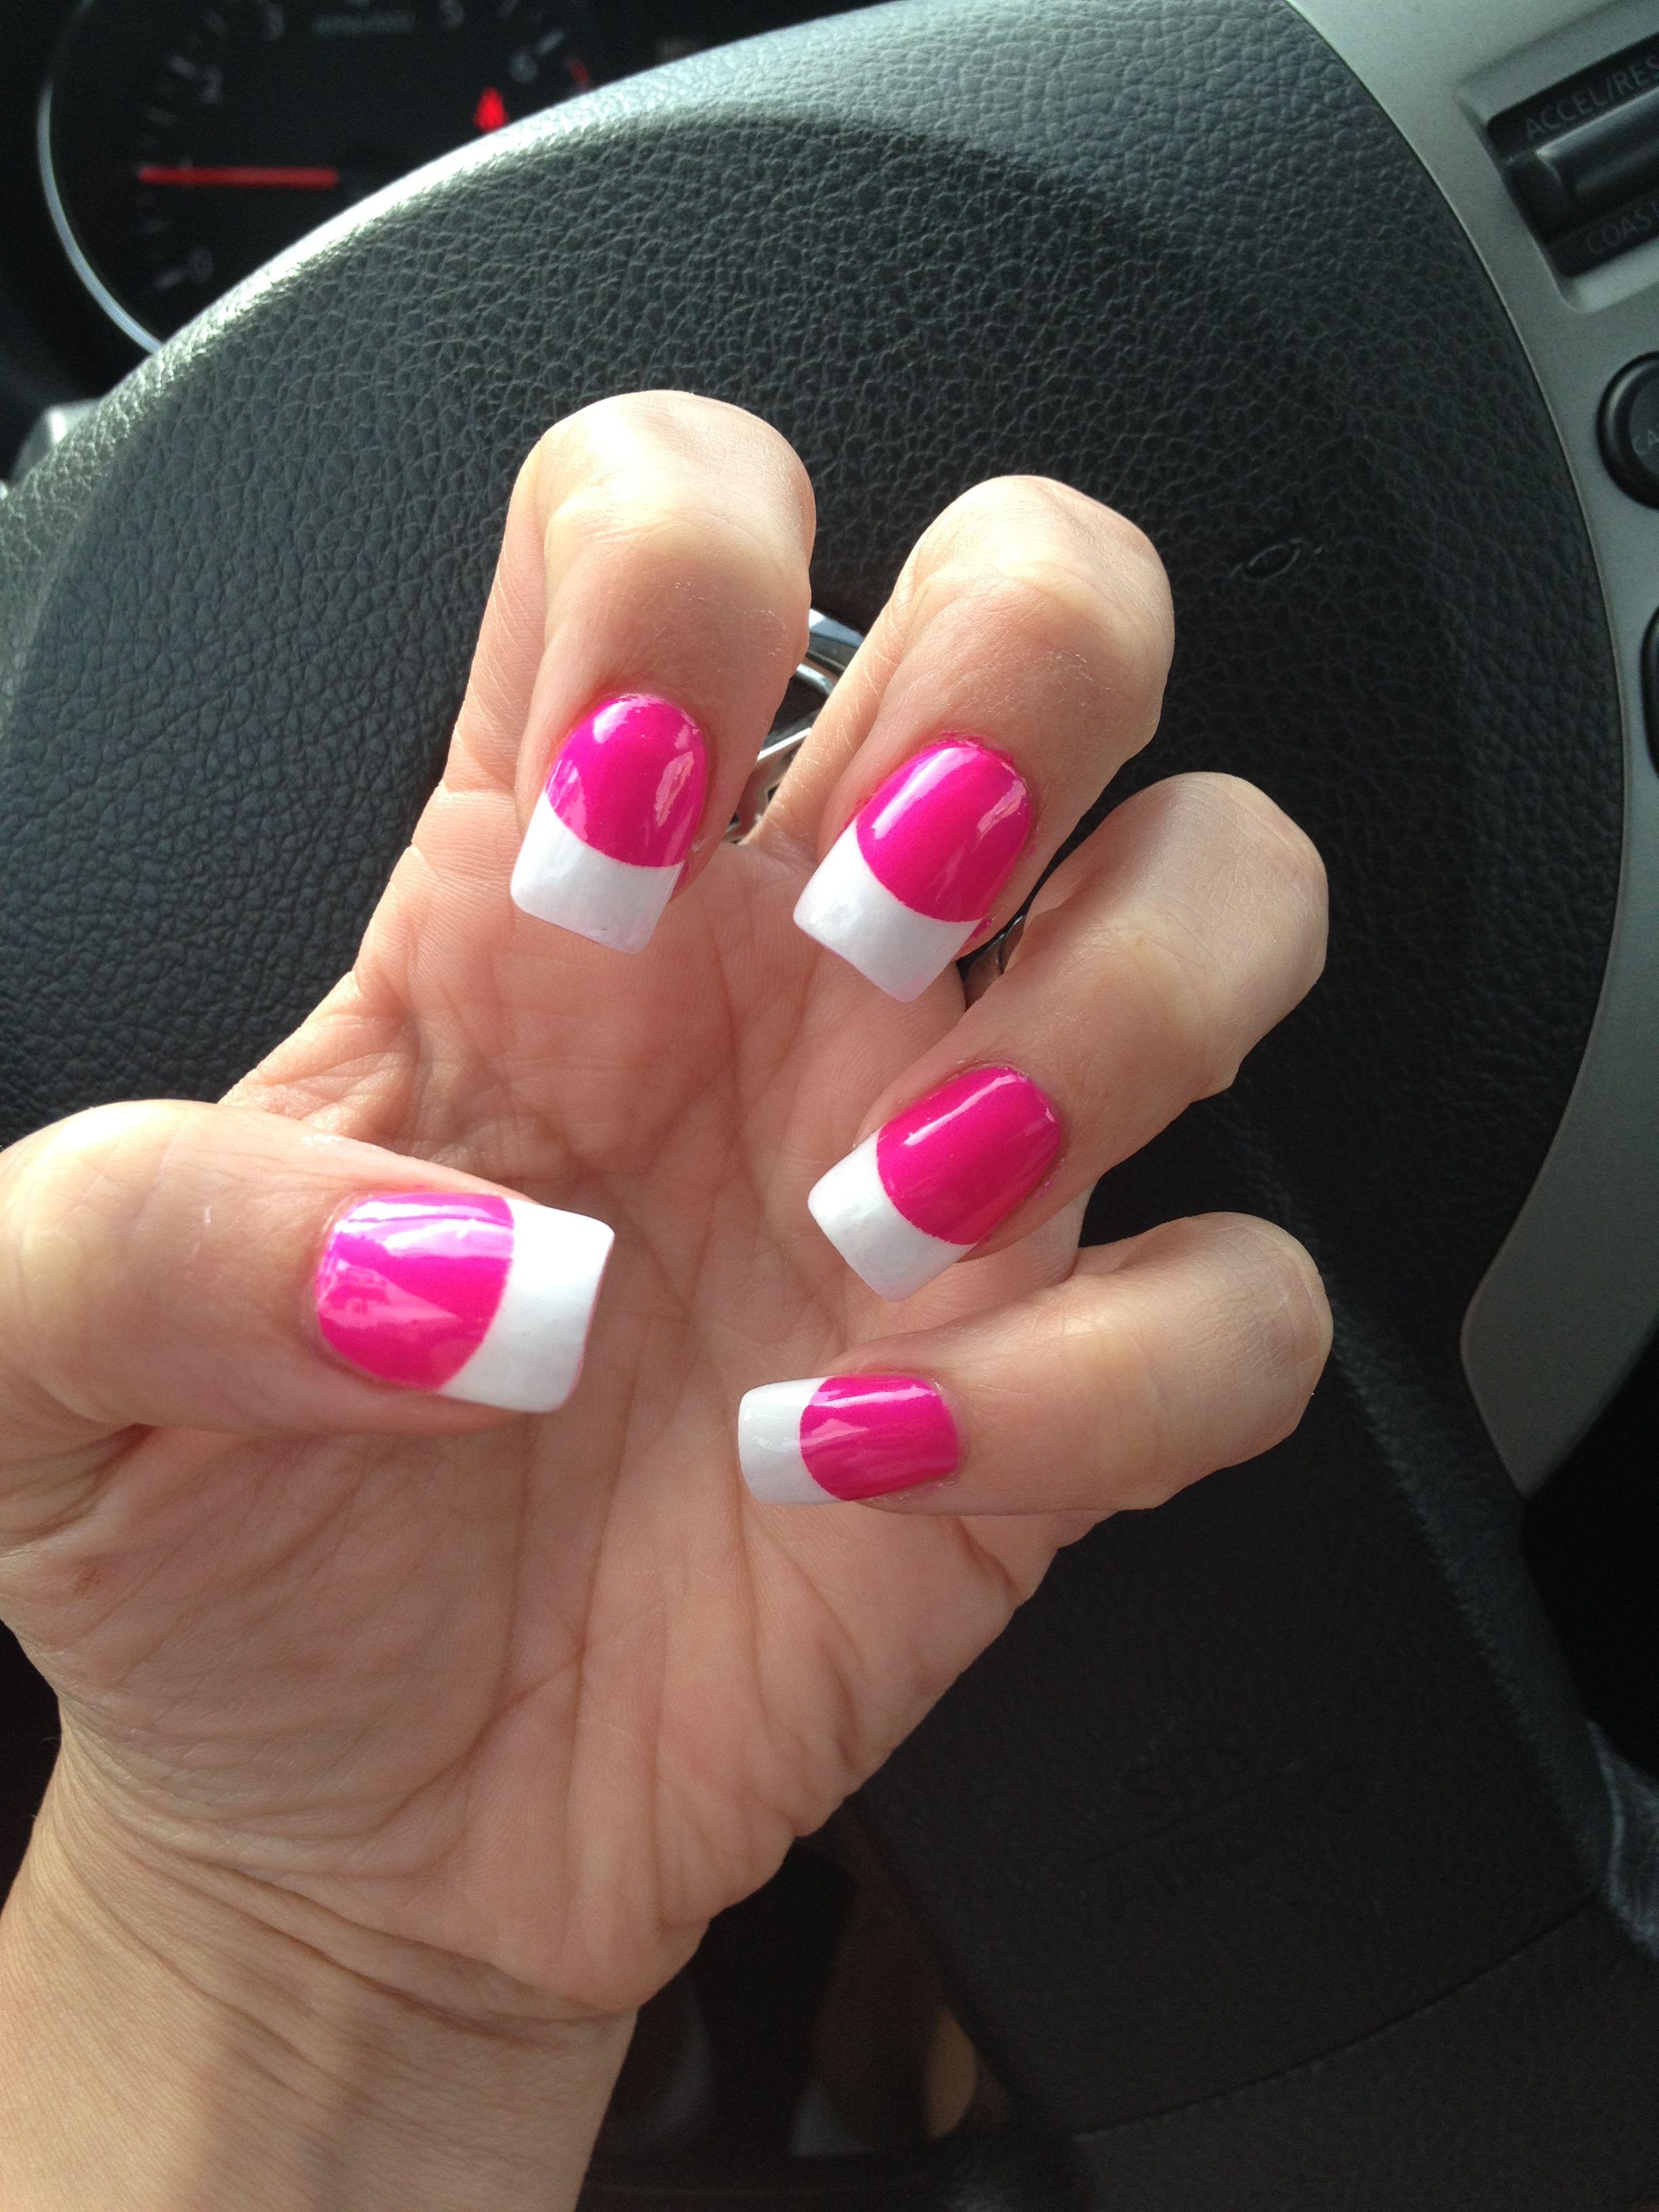 Nails! #chinaglaze #pinkfrench purple panic neon | Nails designs ...